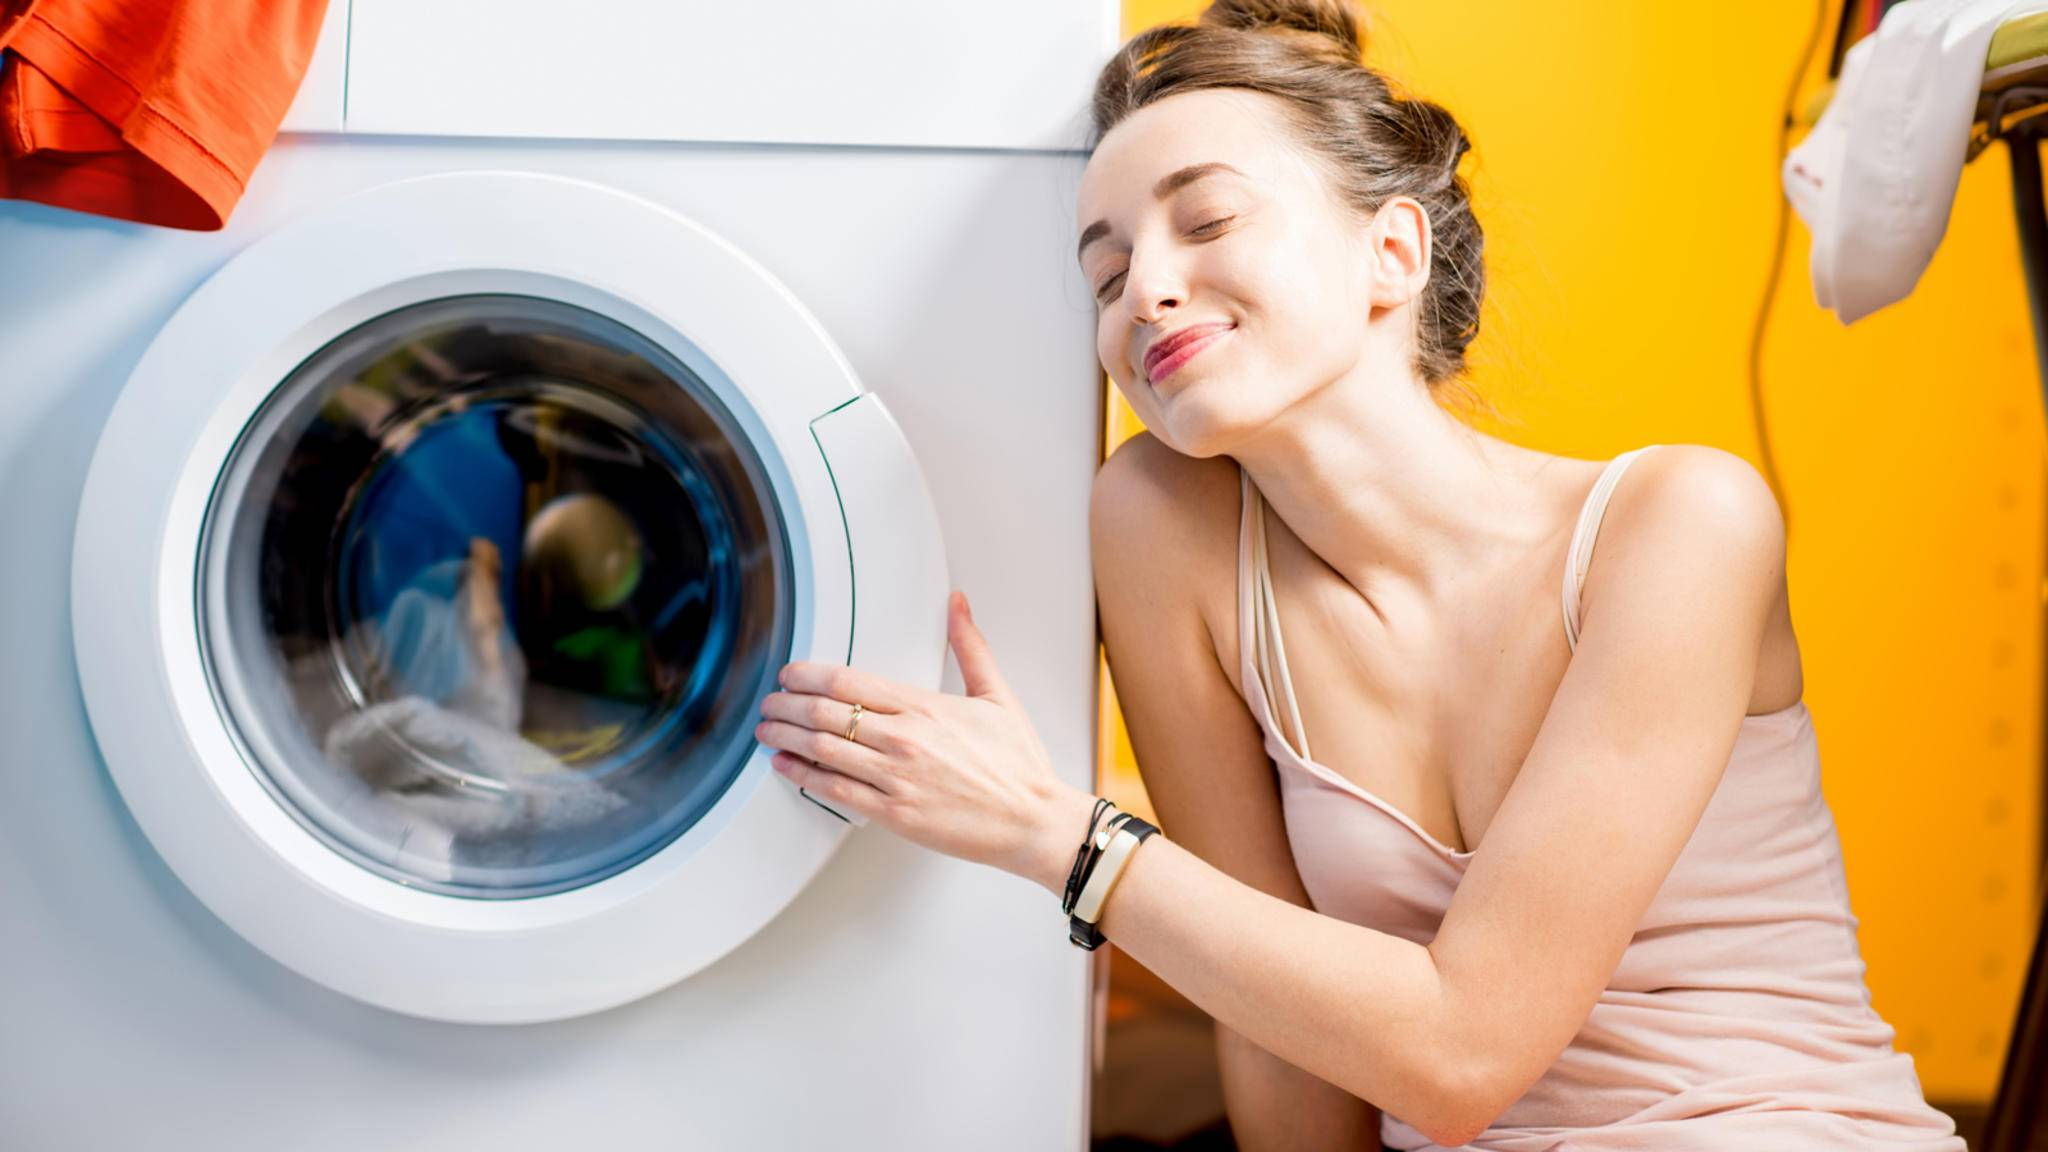 Waschmaschine-Frau-glücklich-AdobeStock-rh2010-139491436